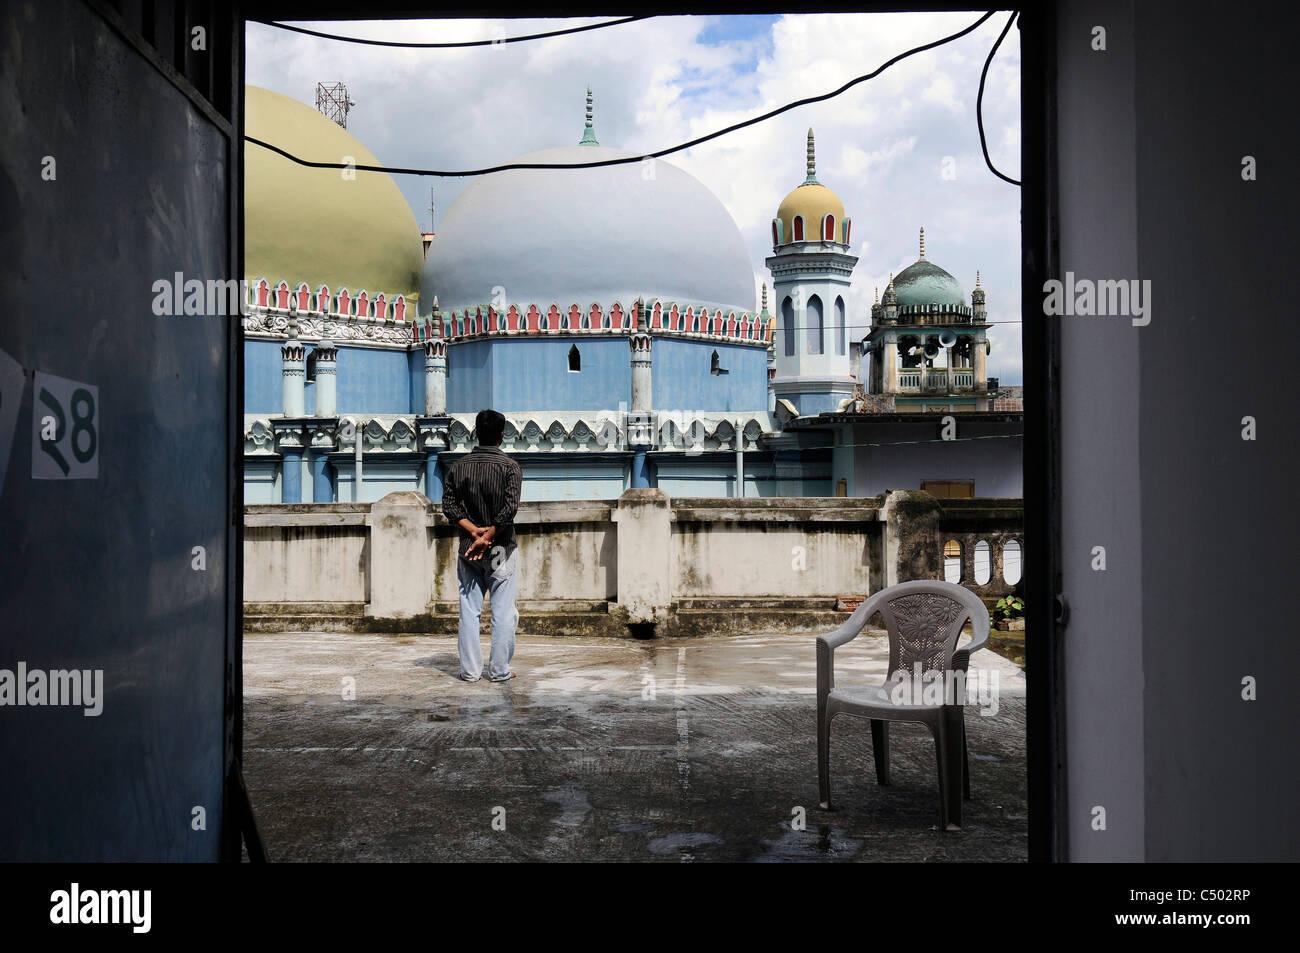 A scene in Tangail, Bangladesh - Stock Image